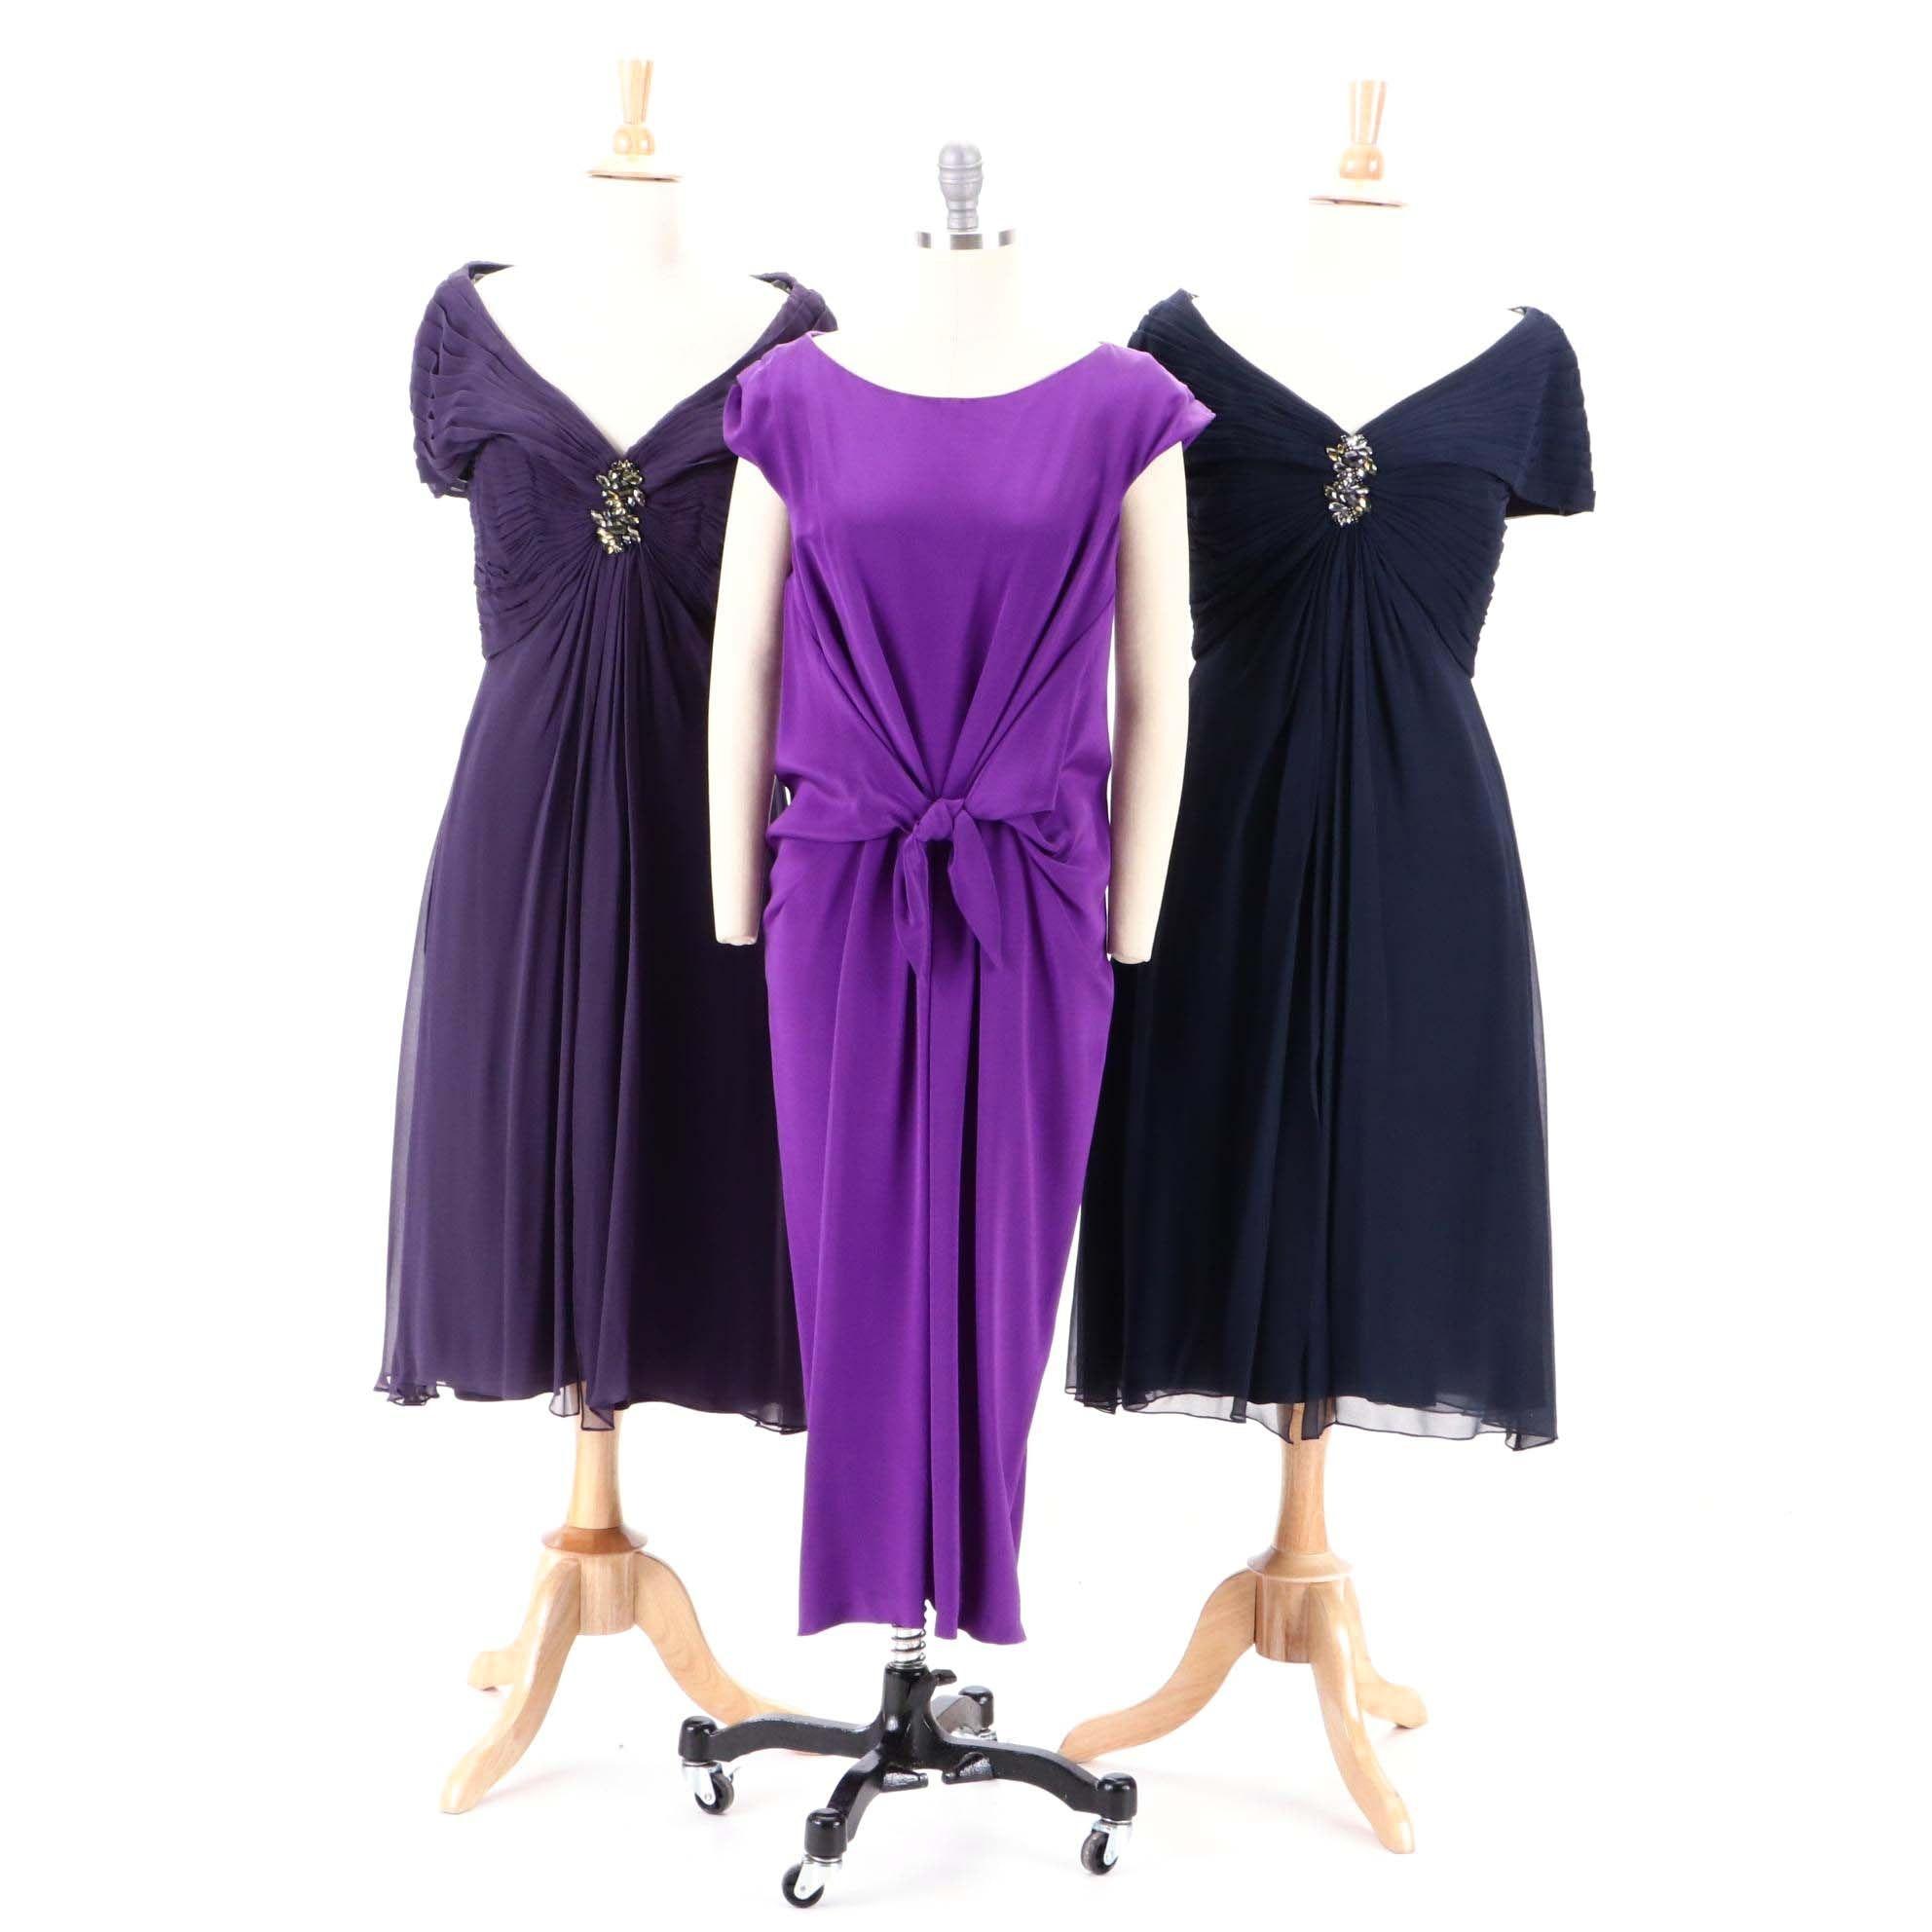 Tadashi Shoji Formal Cocktail Dresses